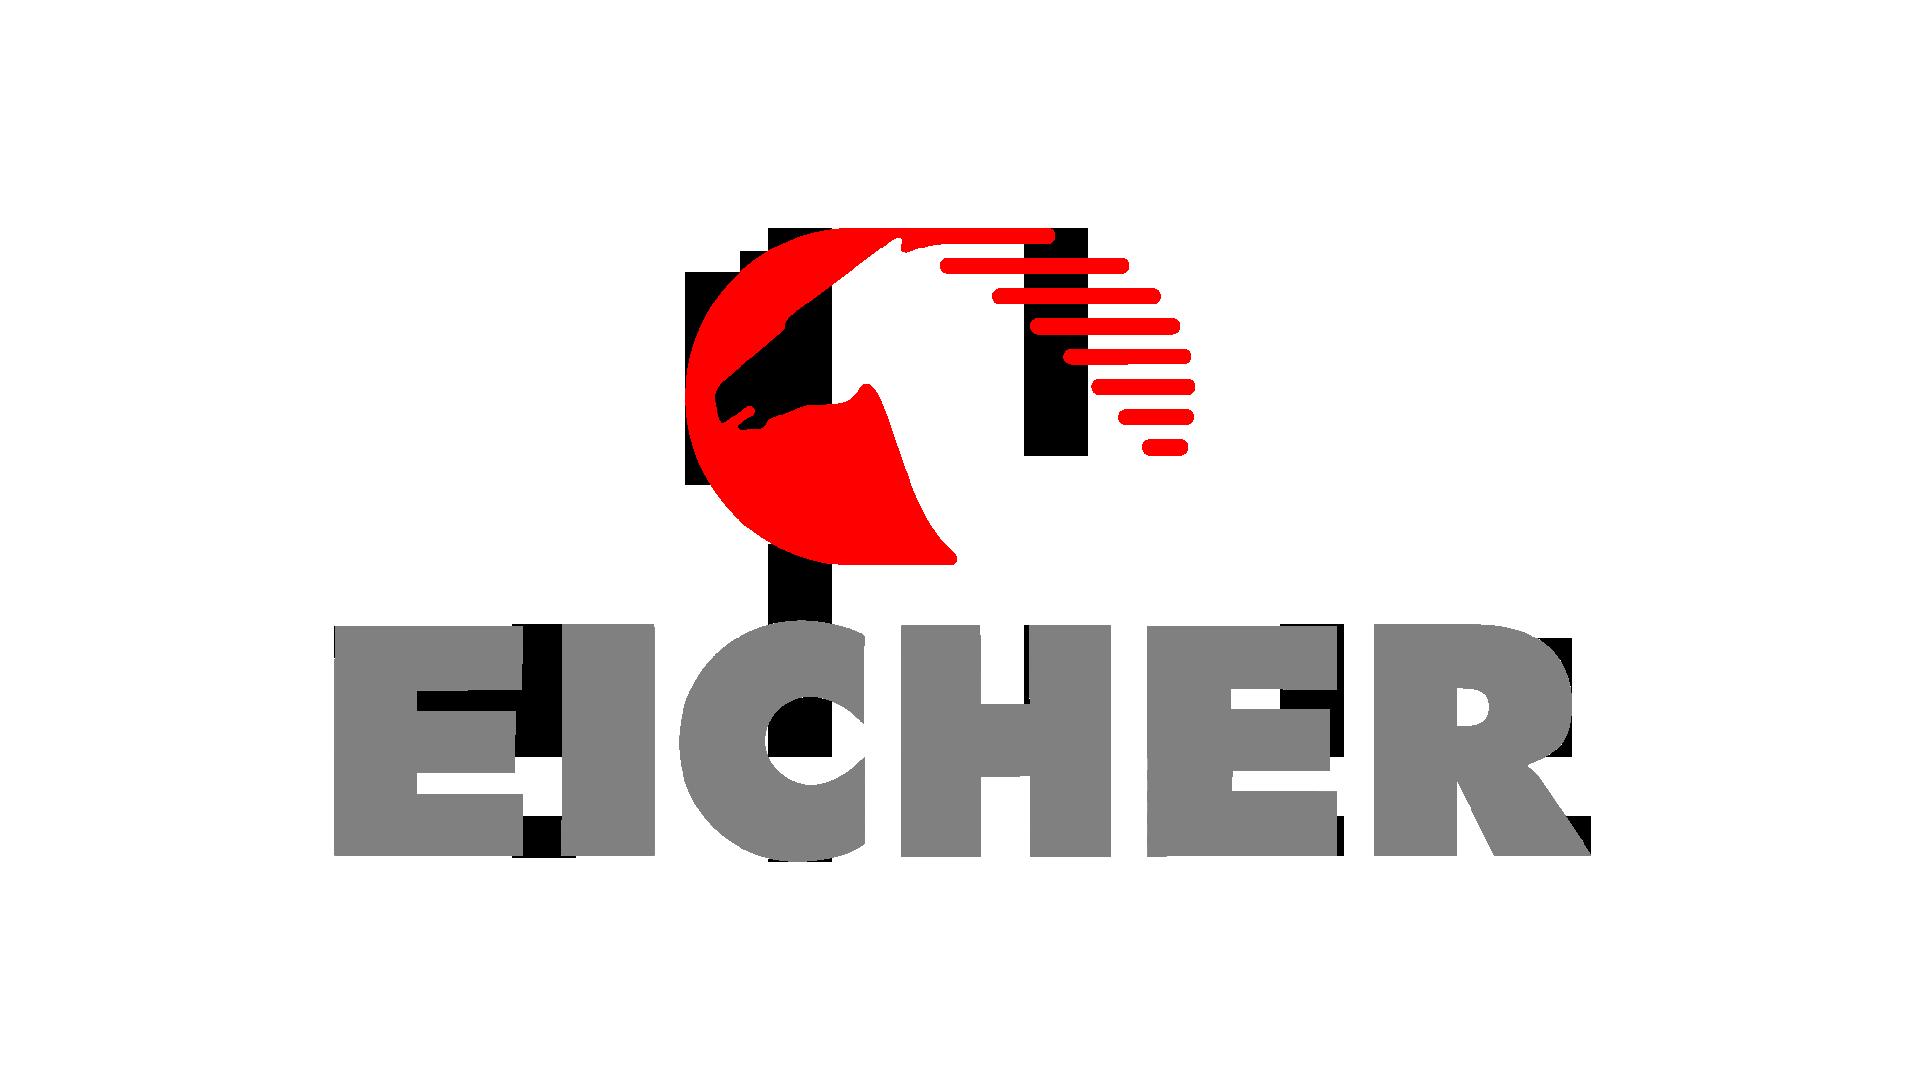 Eicher Logo, HD Png, Information.